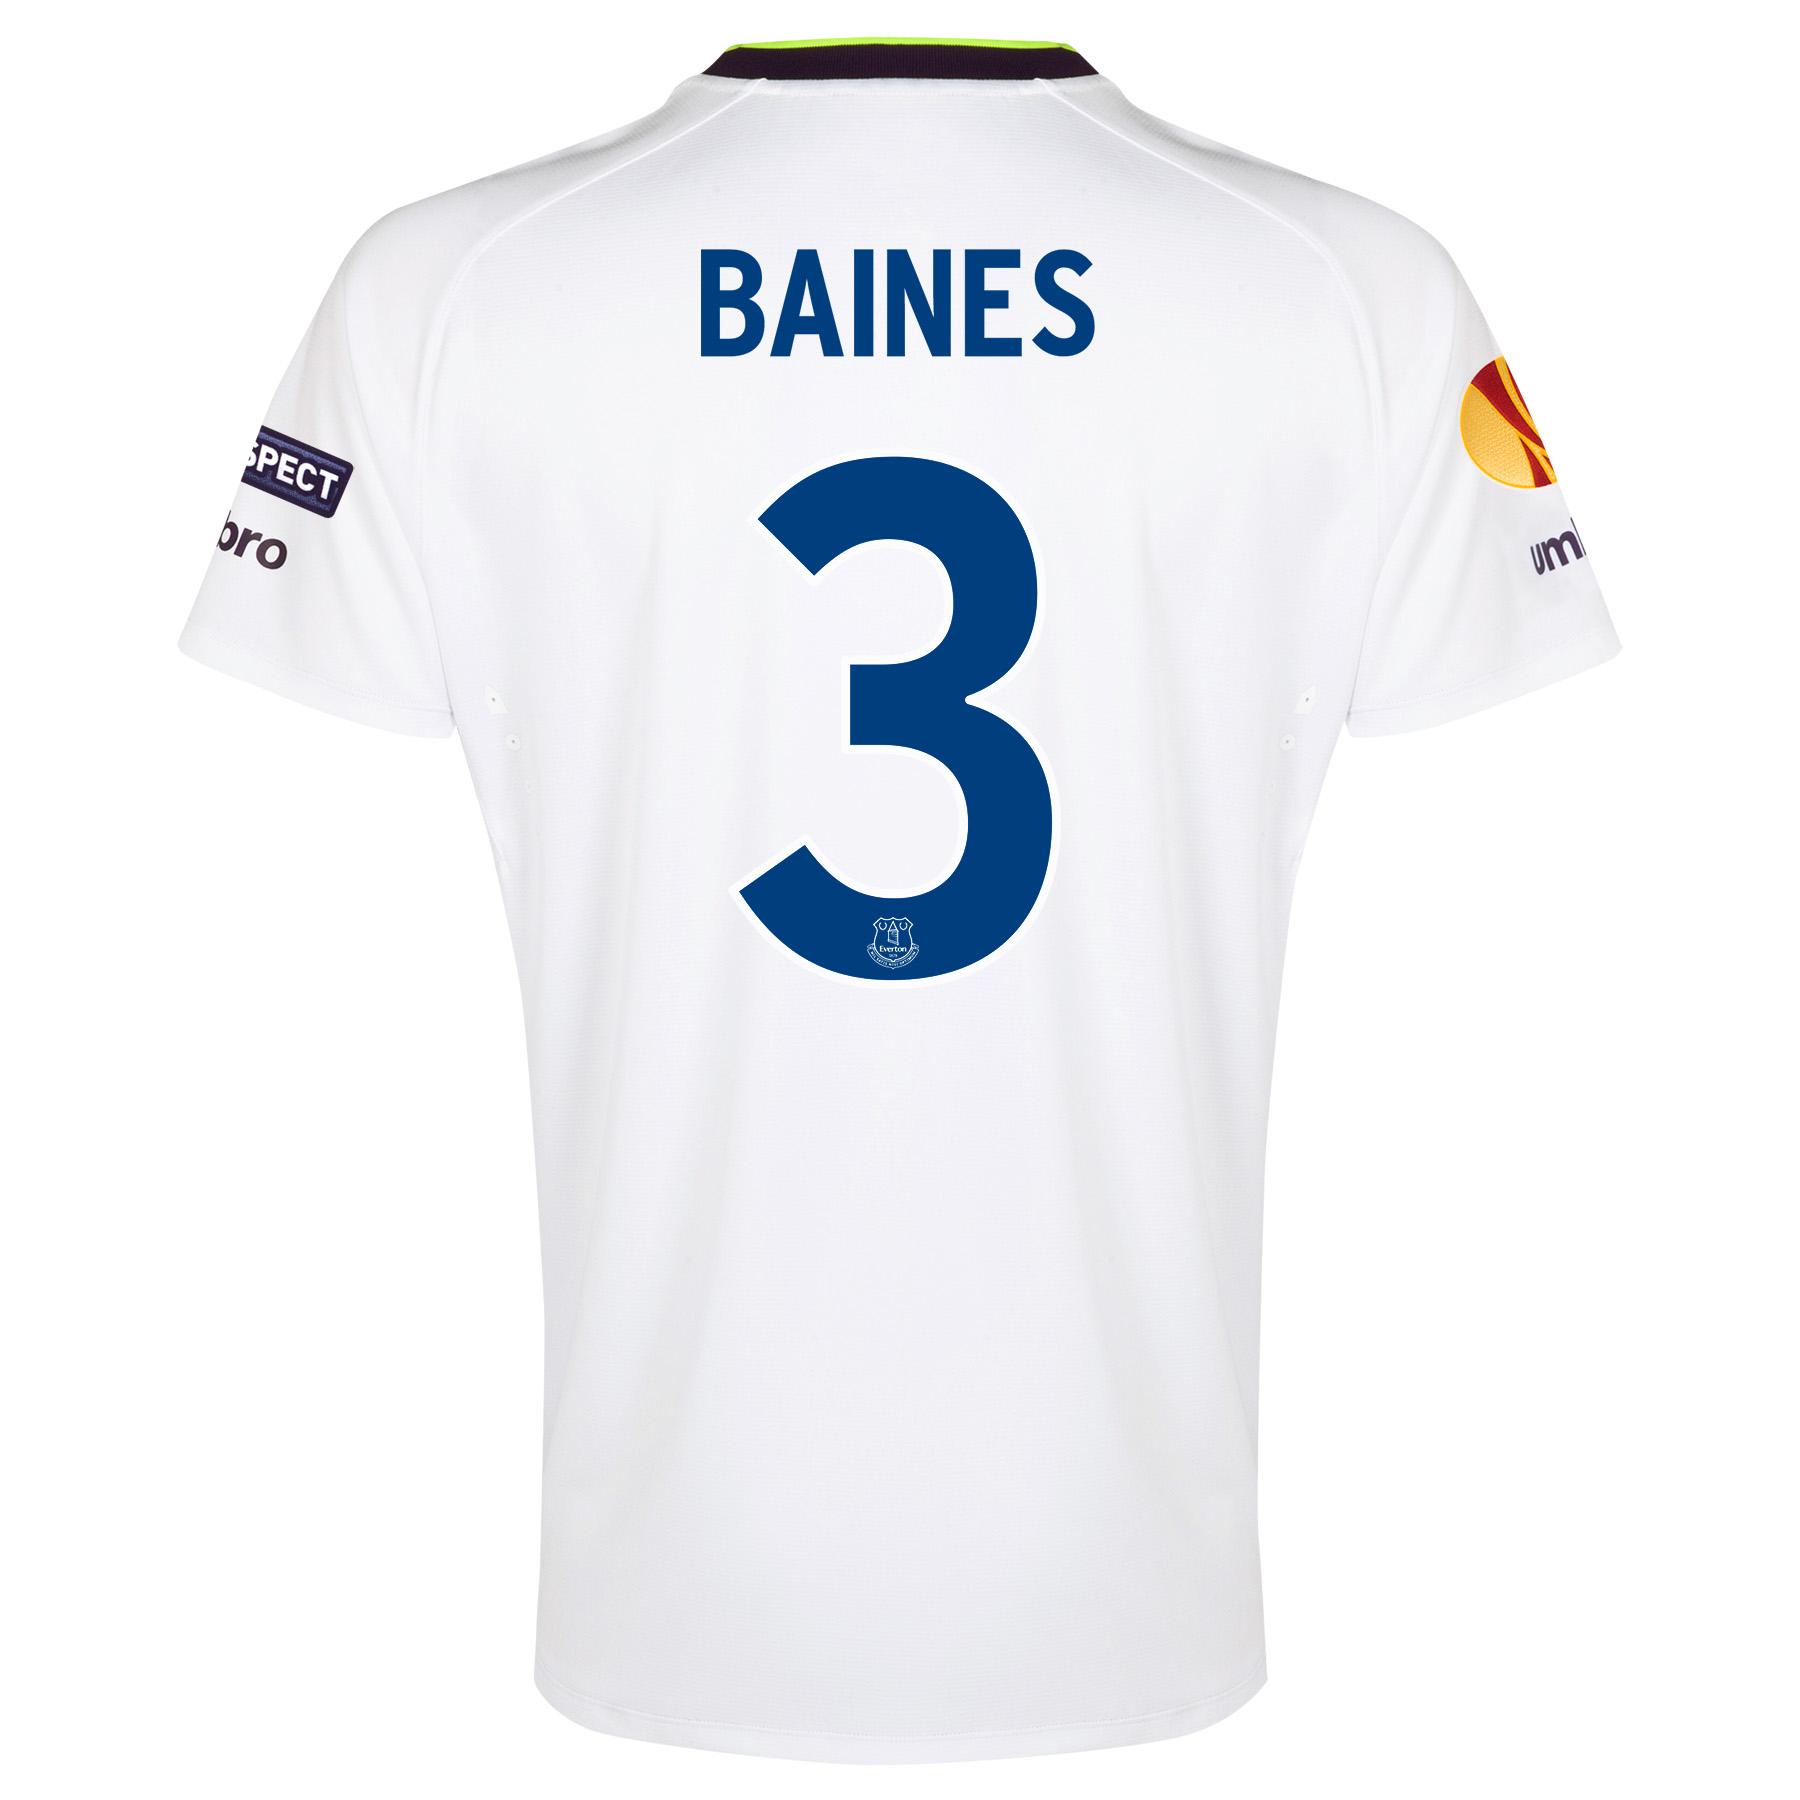 Everton UEFA Europa League 3rd Shirt 2014/15 - Junior with Baines 3 printing